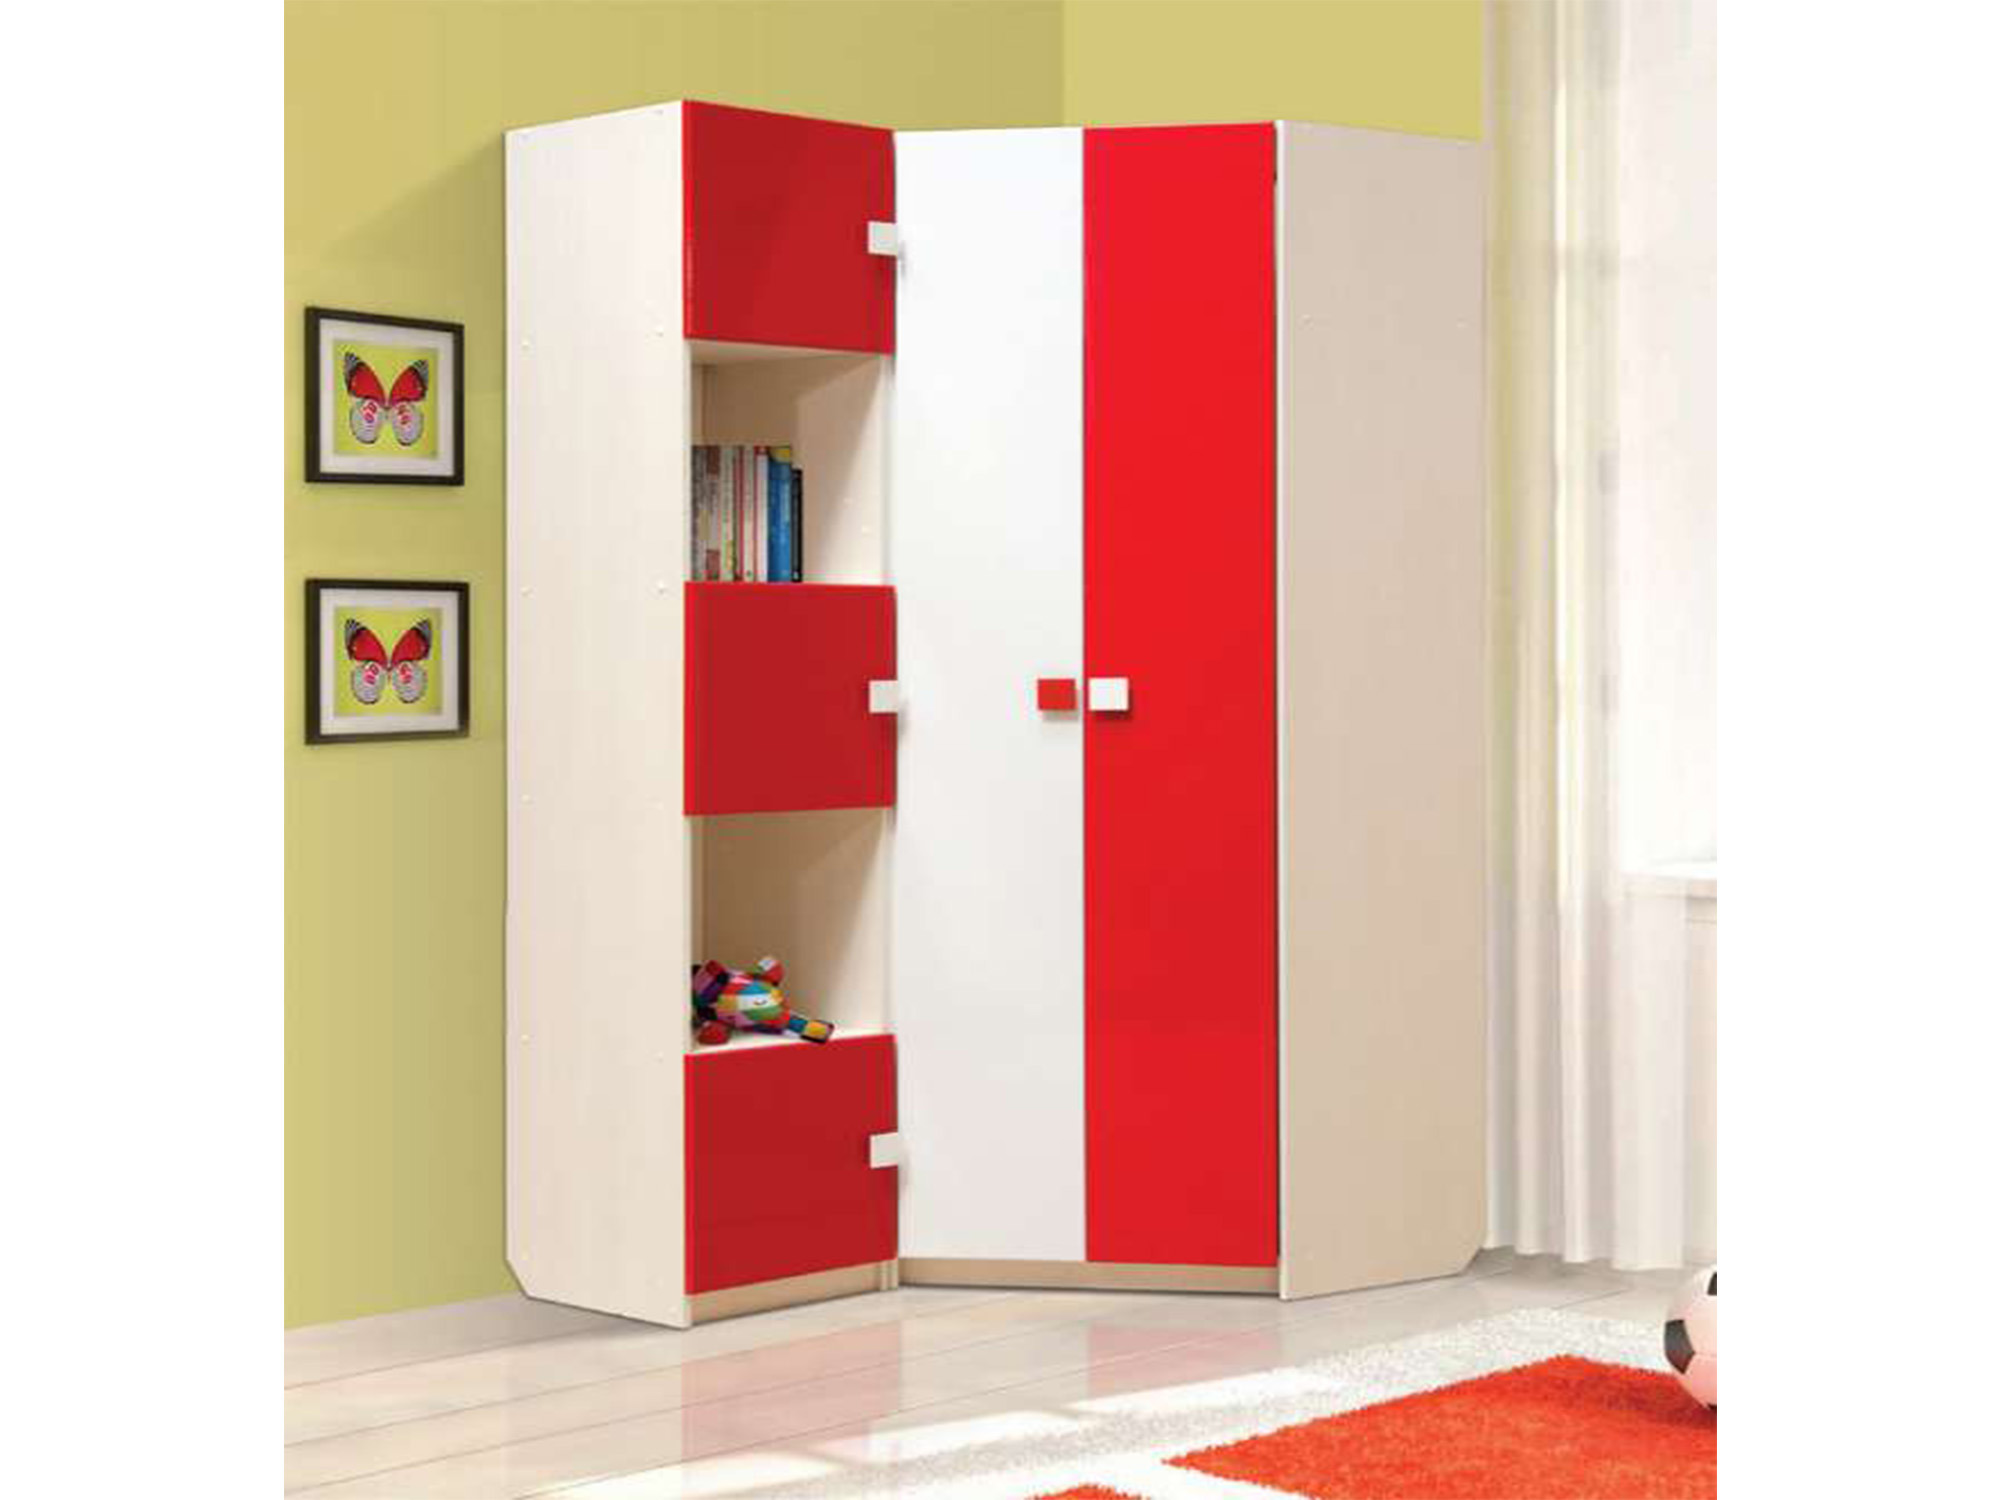 Шкаф угловой Кокетка-2Угловые шкафы<br><br><br>Длина мм: 0<br>Высота мм: 2200<br>Глубина мм: 450